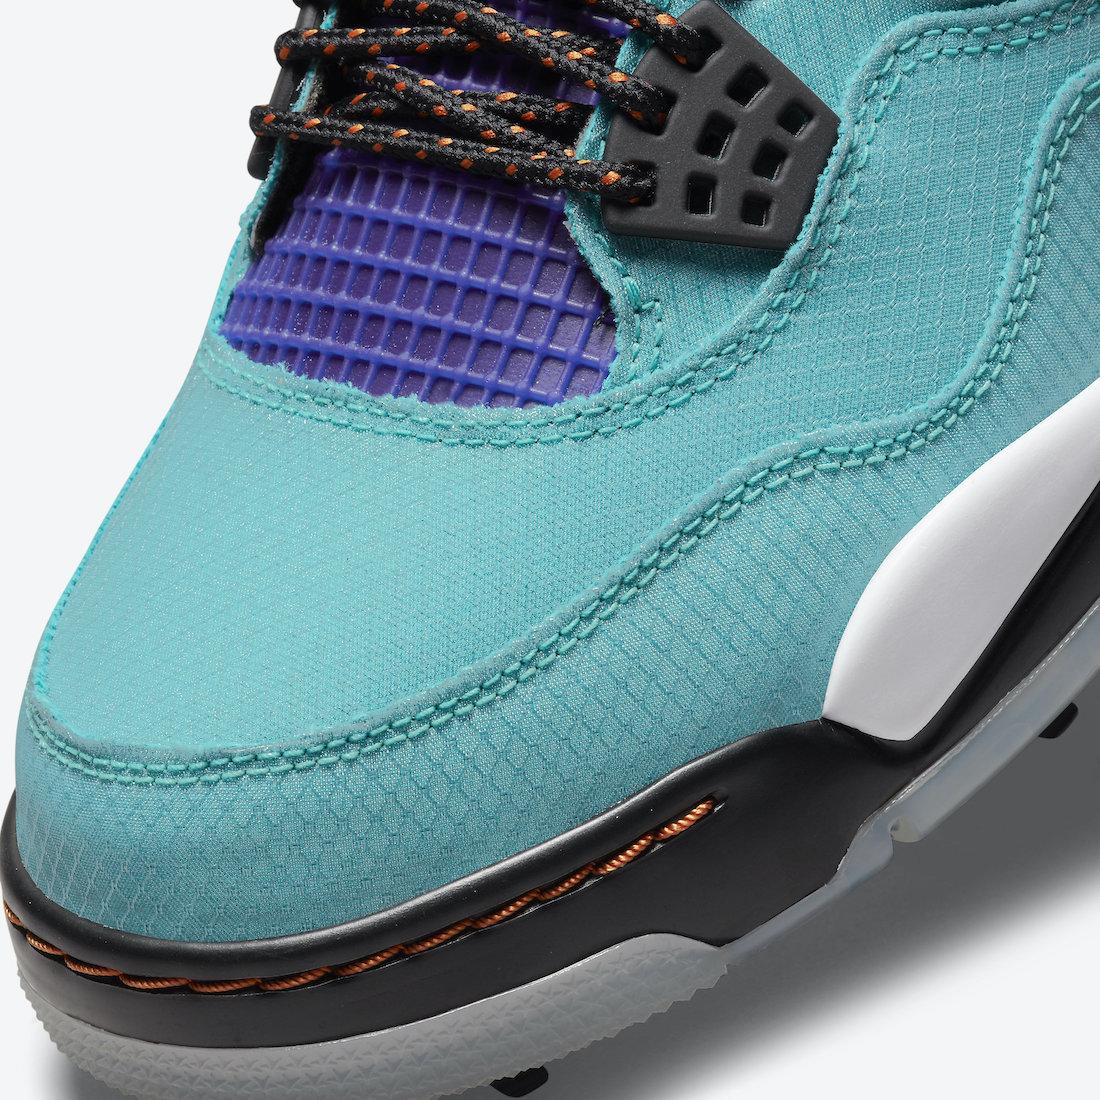 Air Jordan 4 Golf NRG ACG CZ2439-300 Release Date Info